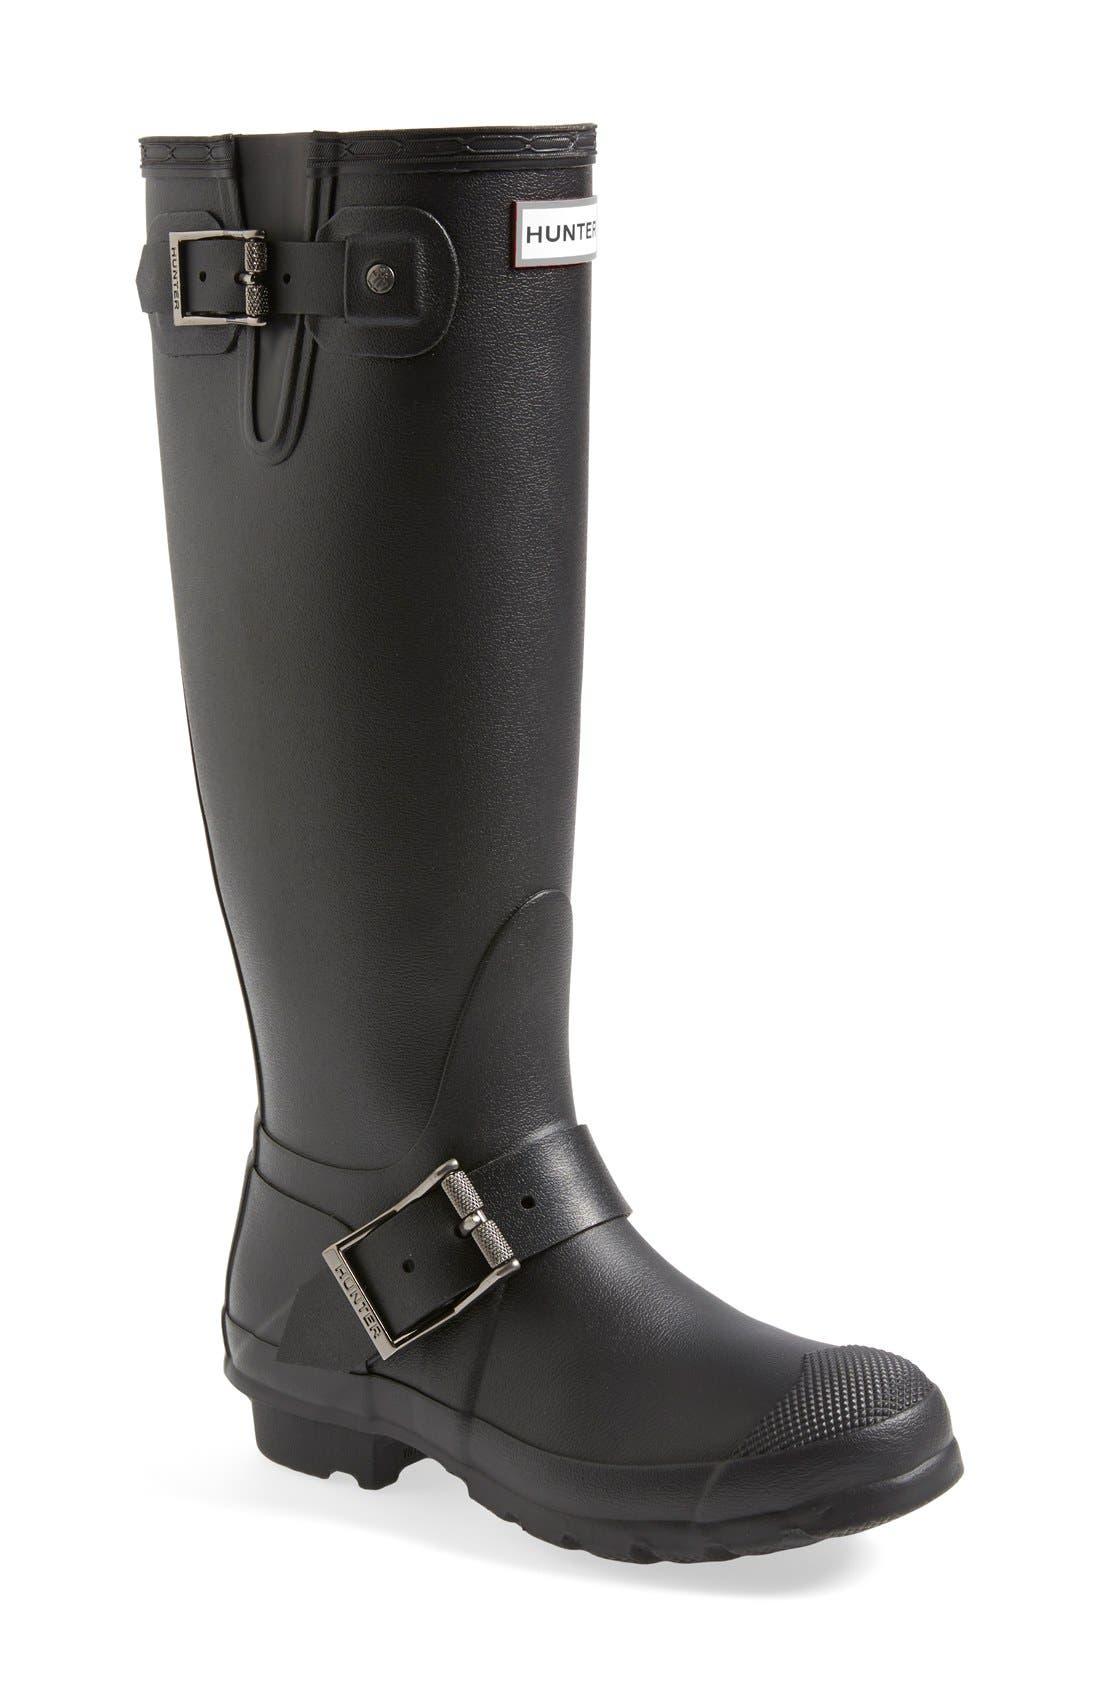 Alternate Image 1 Selected - Hunter 'Tall Moto' Rain Boot (Nordstrom Exclusive) (Women)